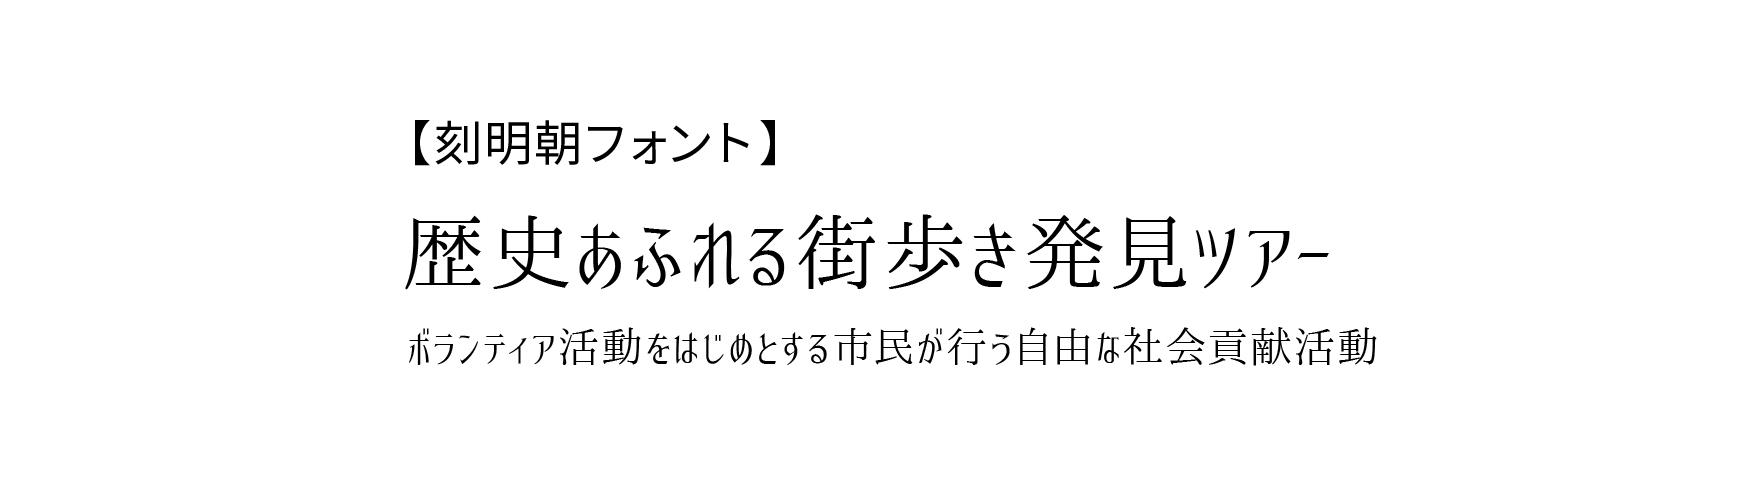 170508image630x360_sumple_kokumin